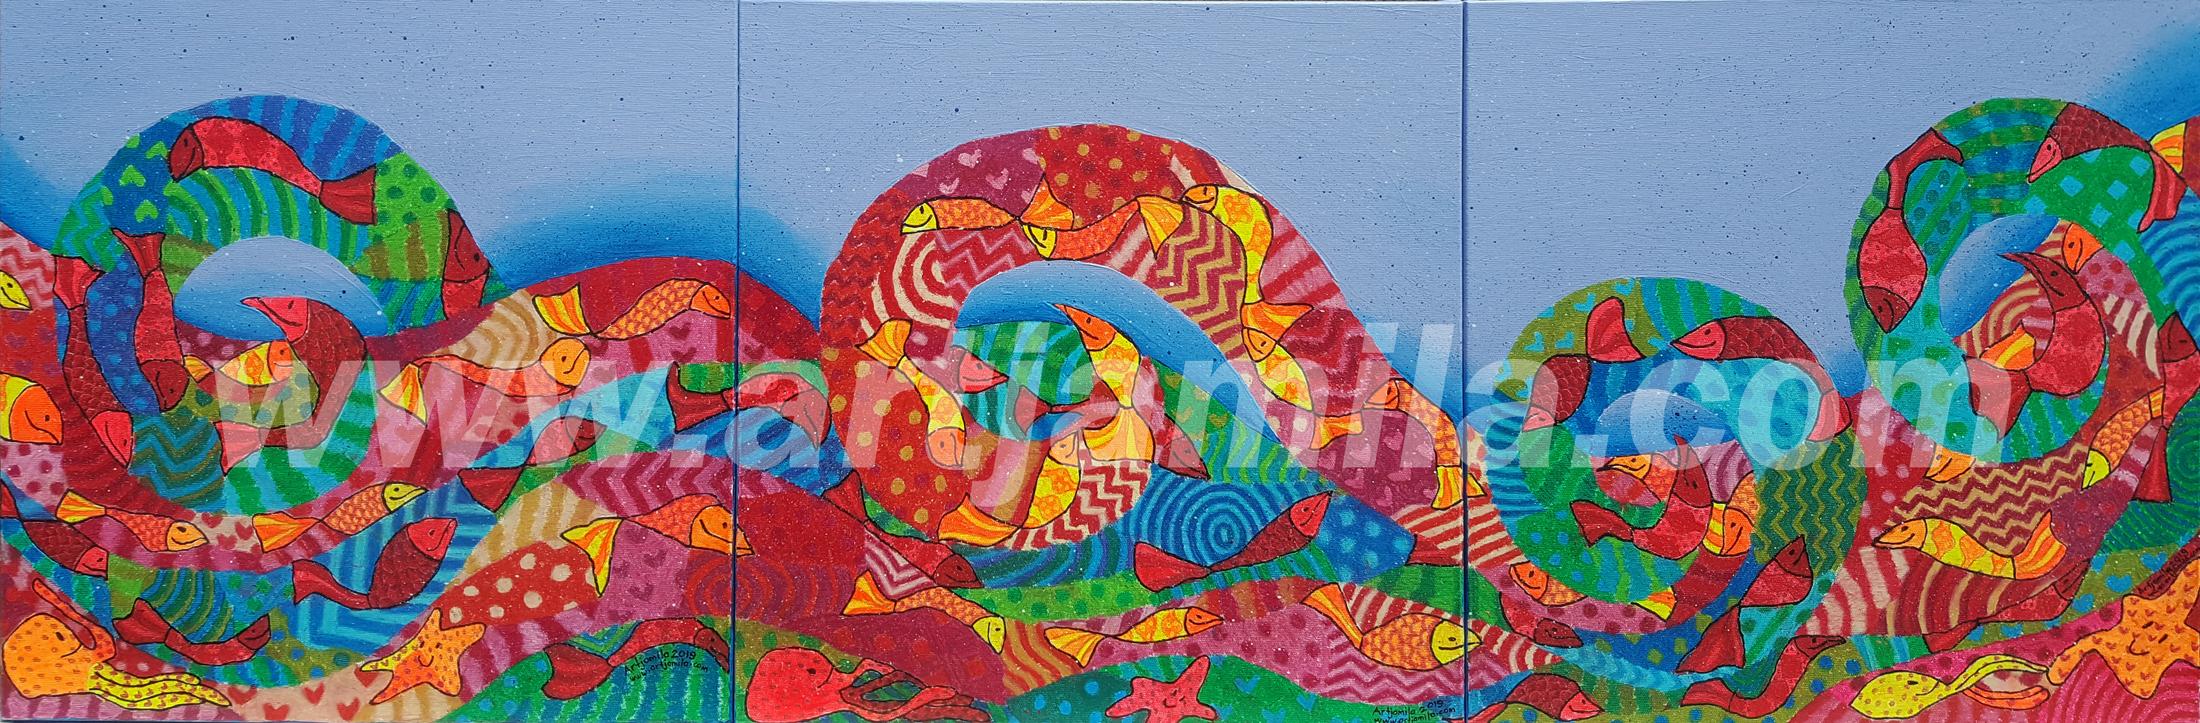 Fishmosaic Wave Series 4A 4B 4C. watermark